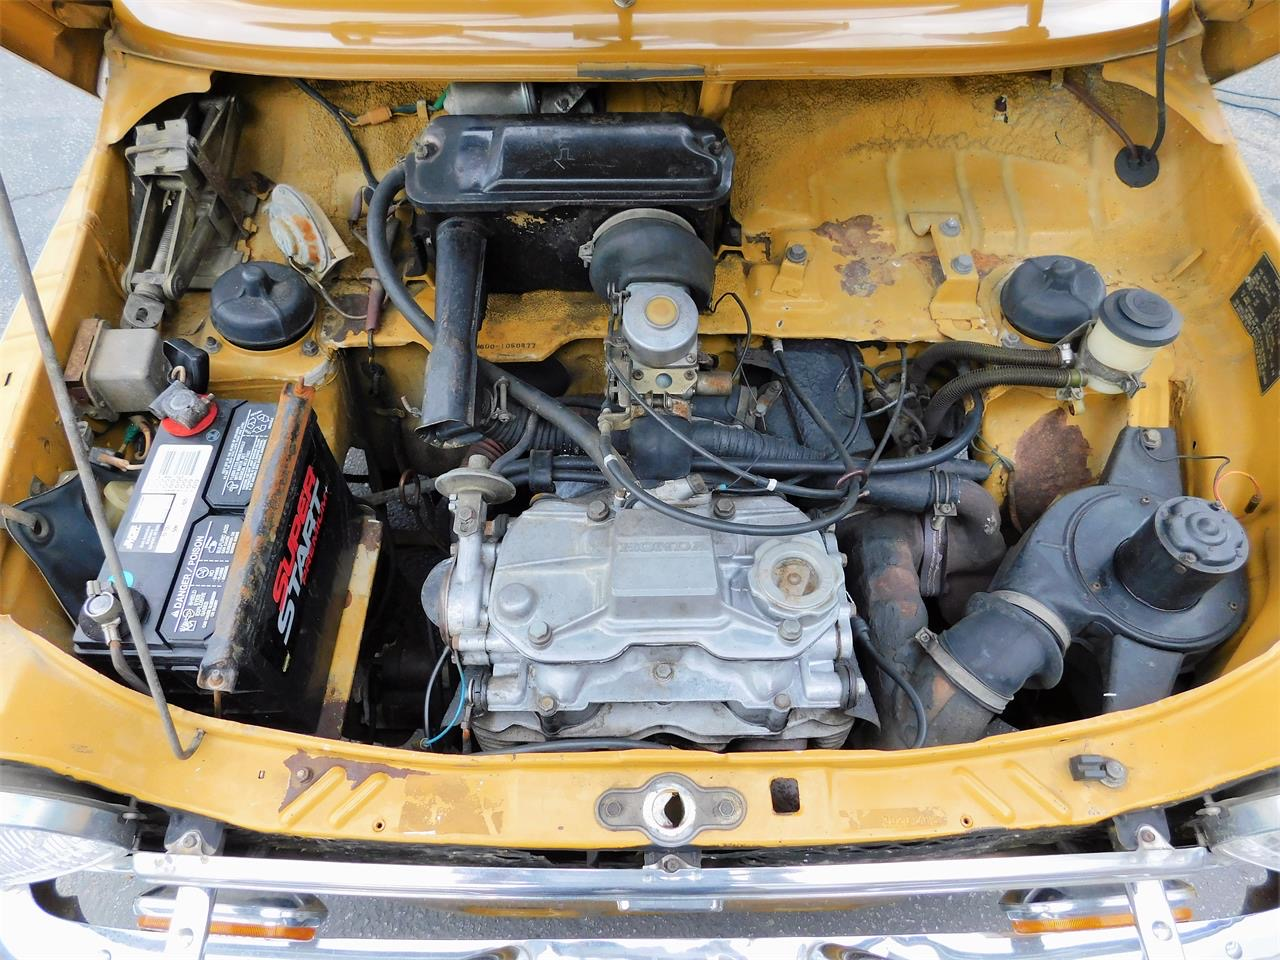 N600's engine